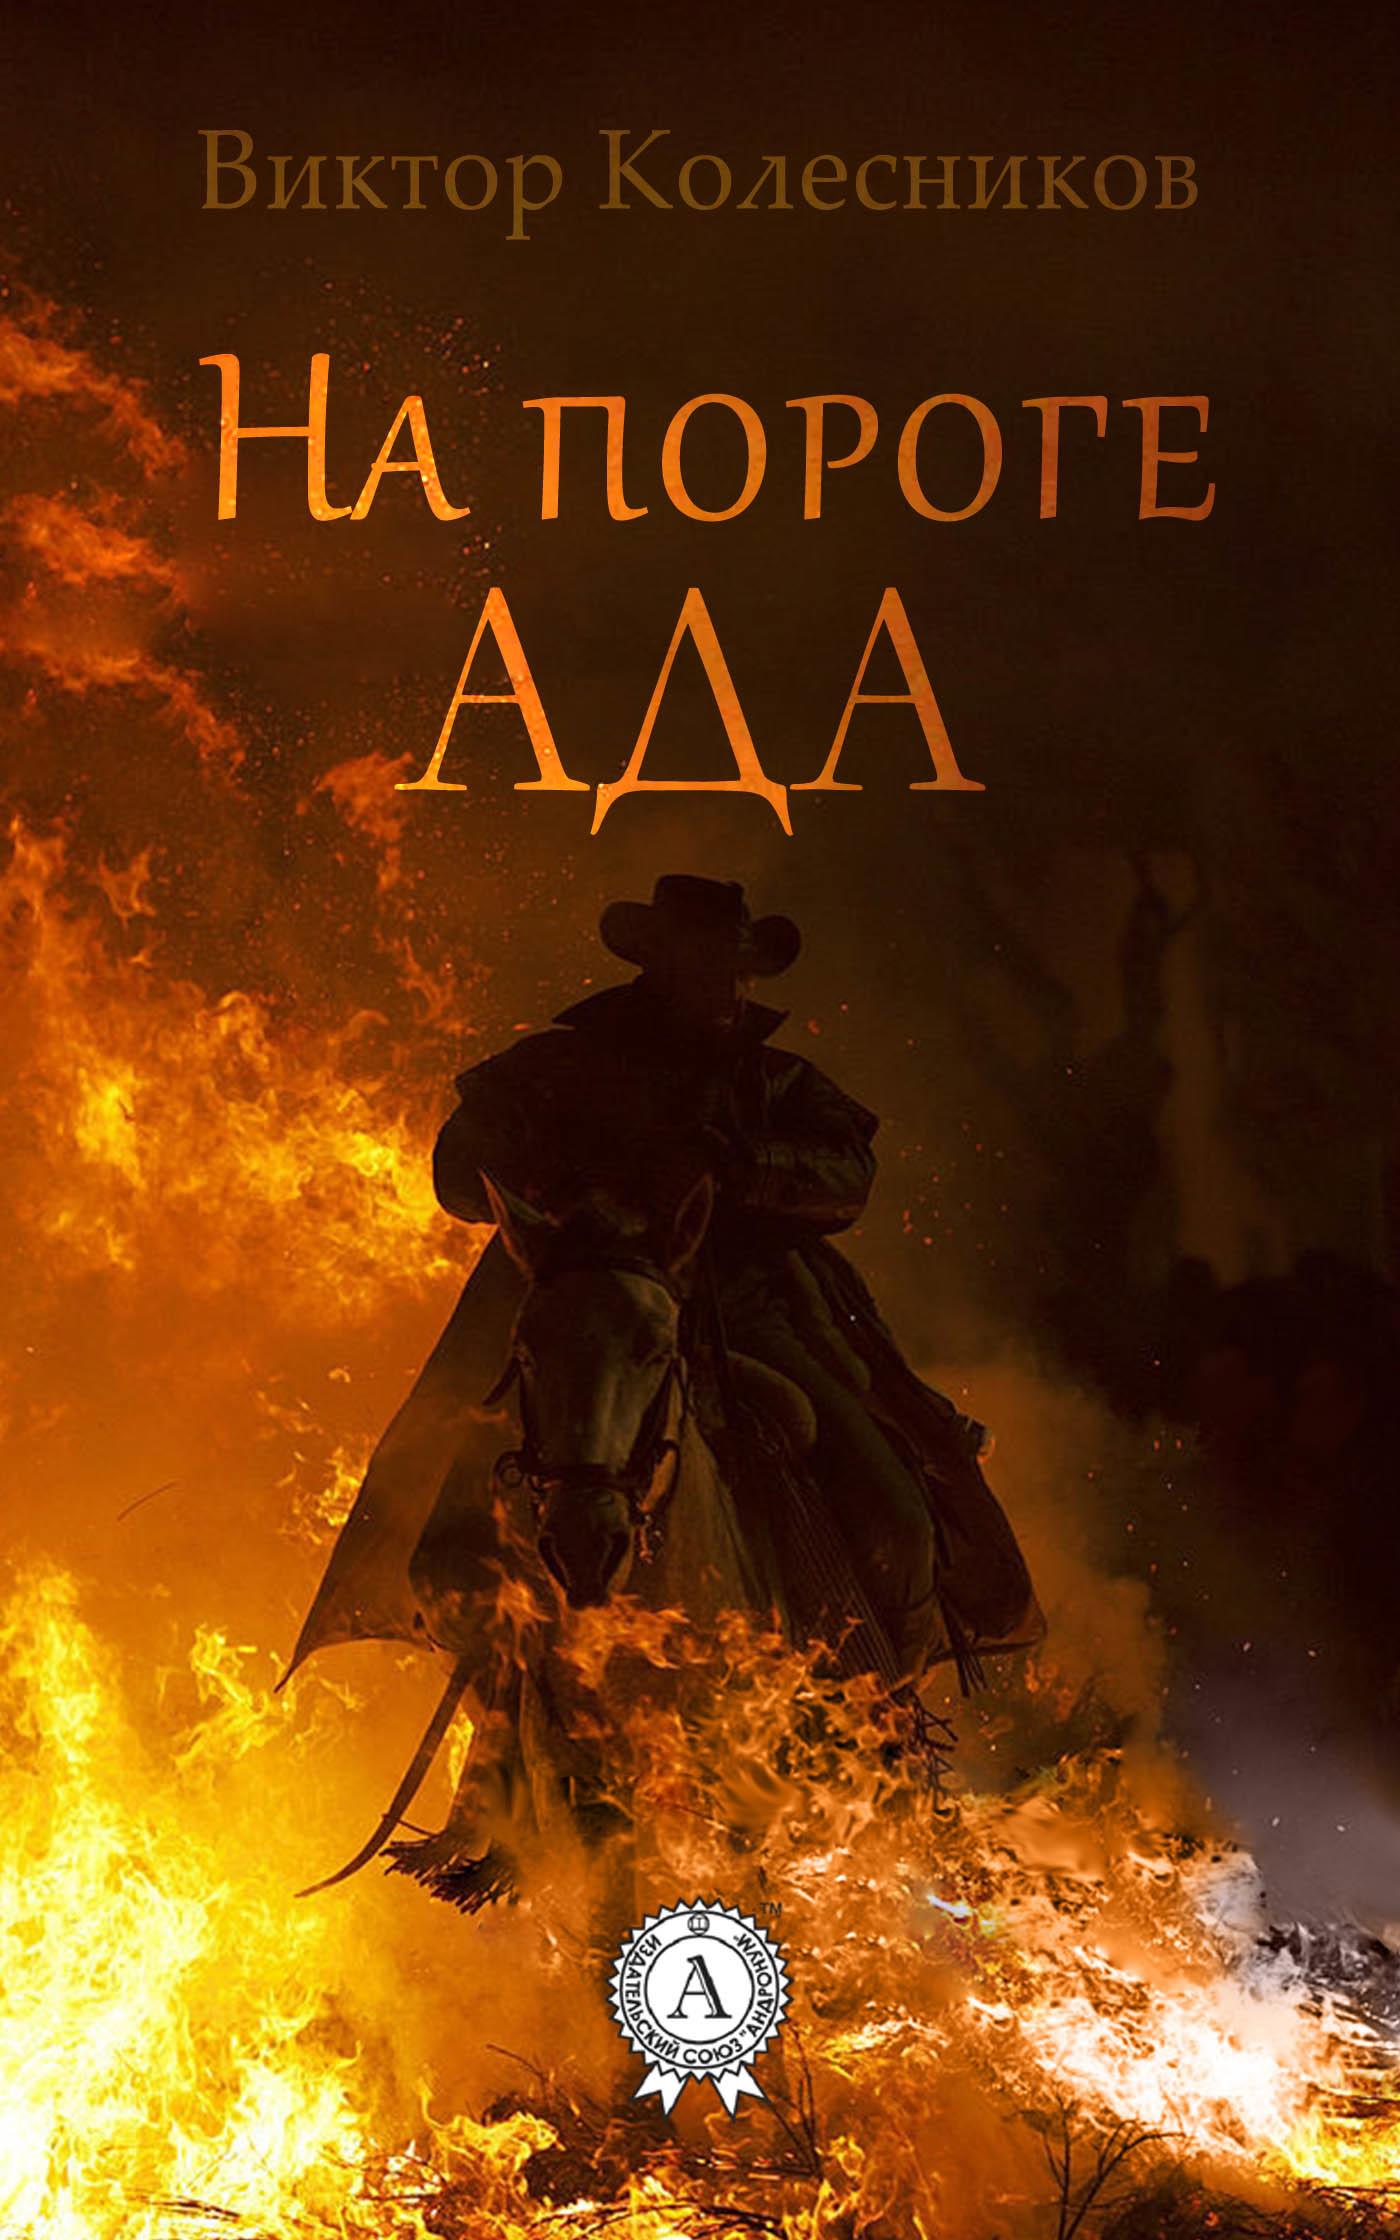 Виктор Колесников - На пороге ада